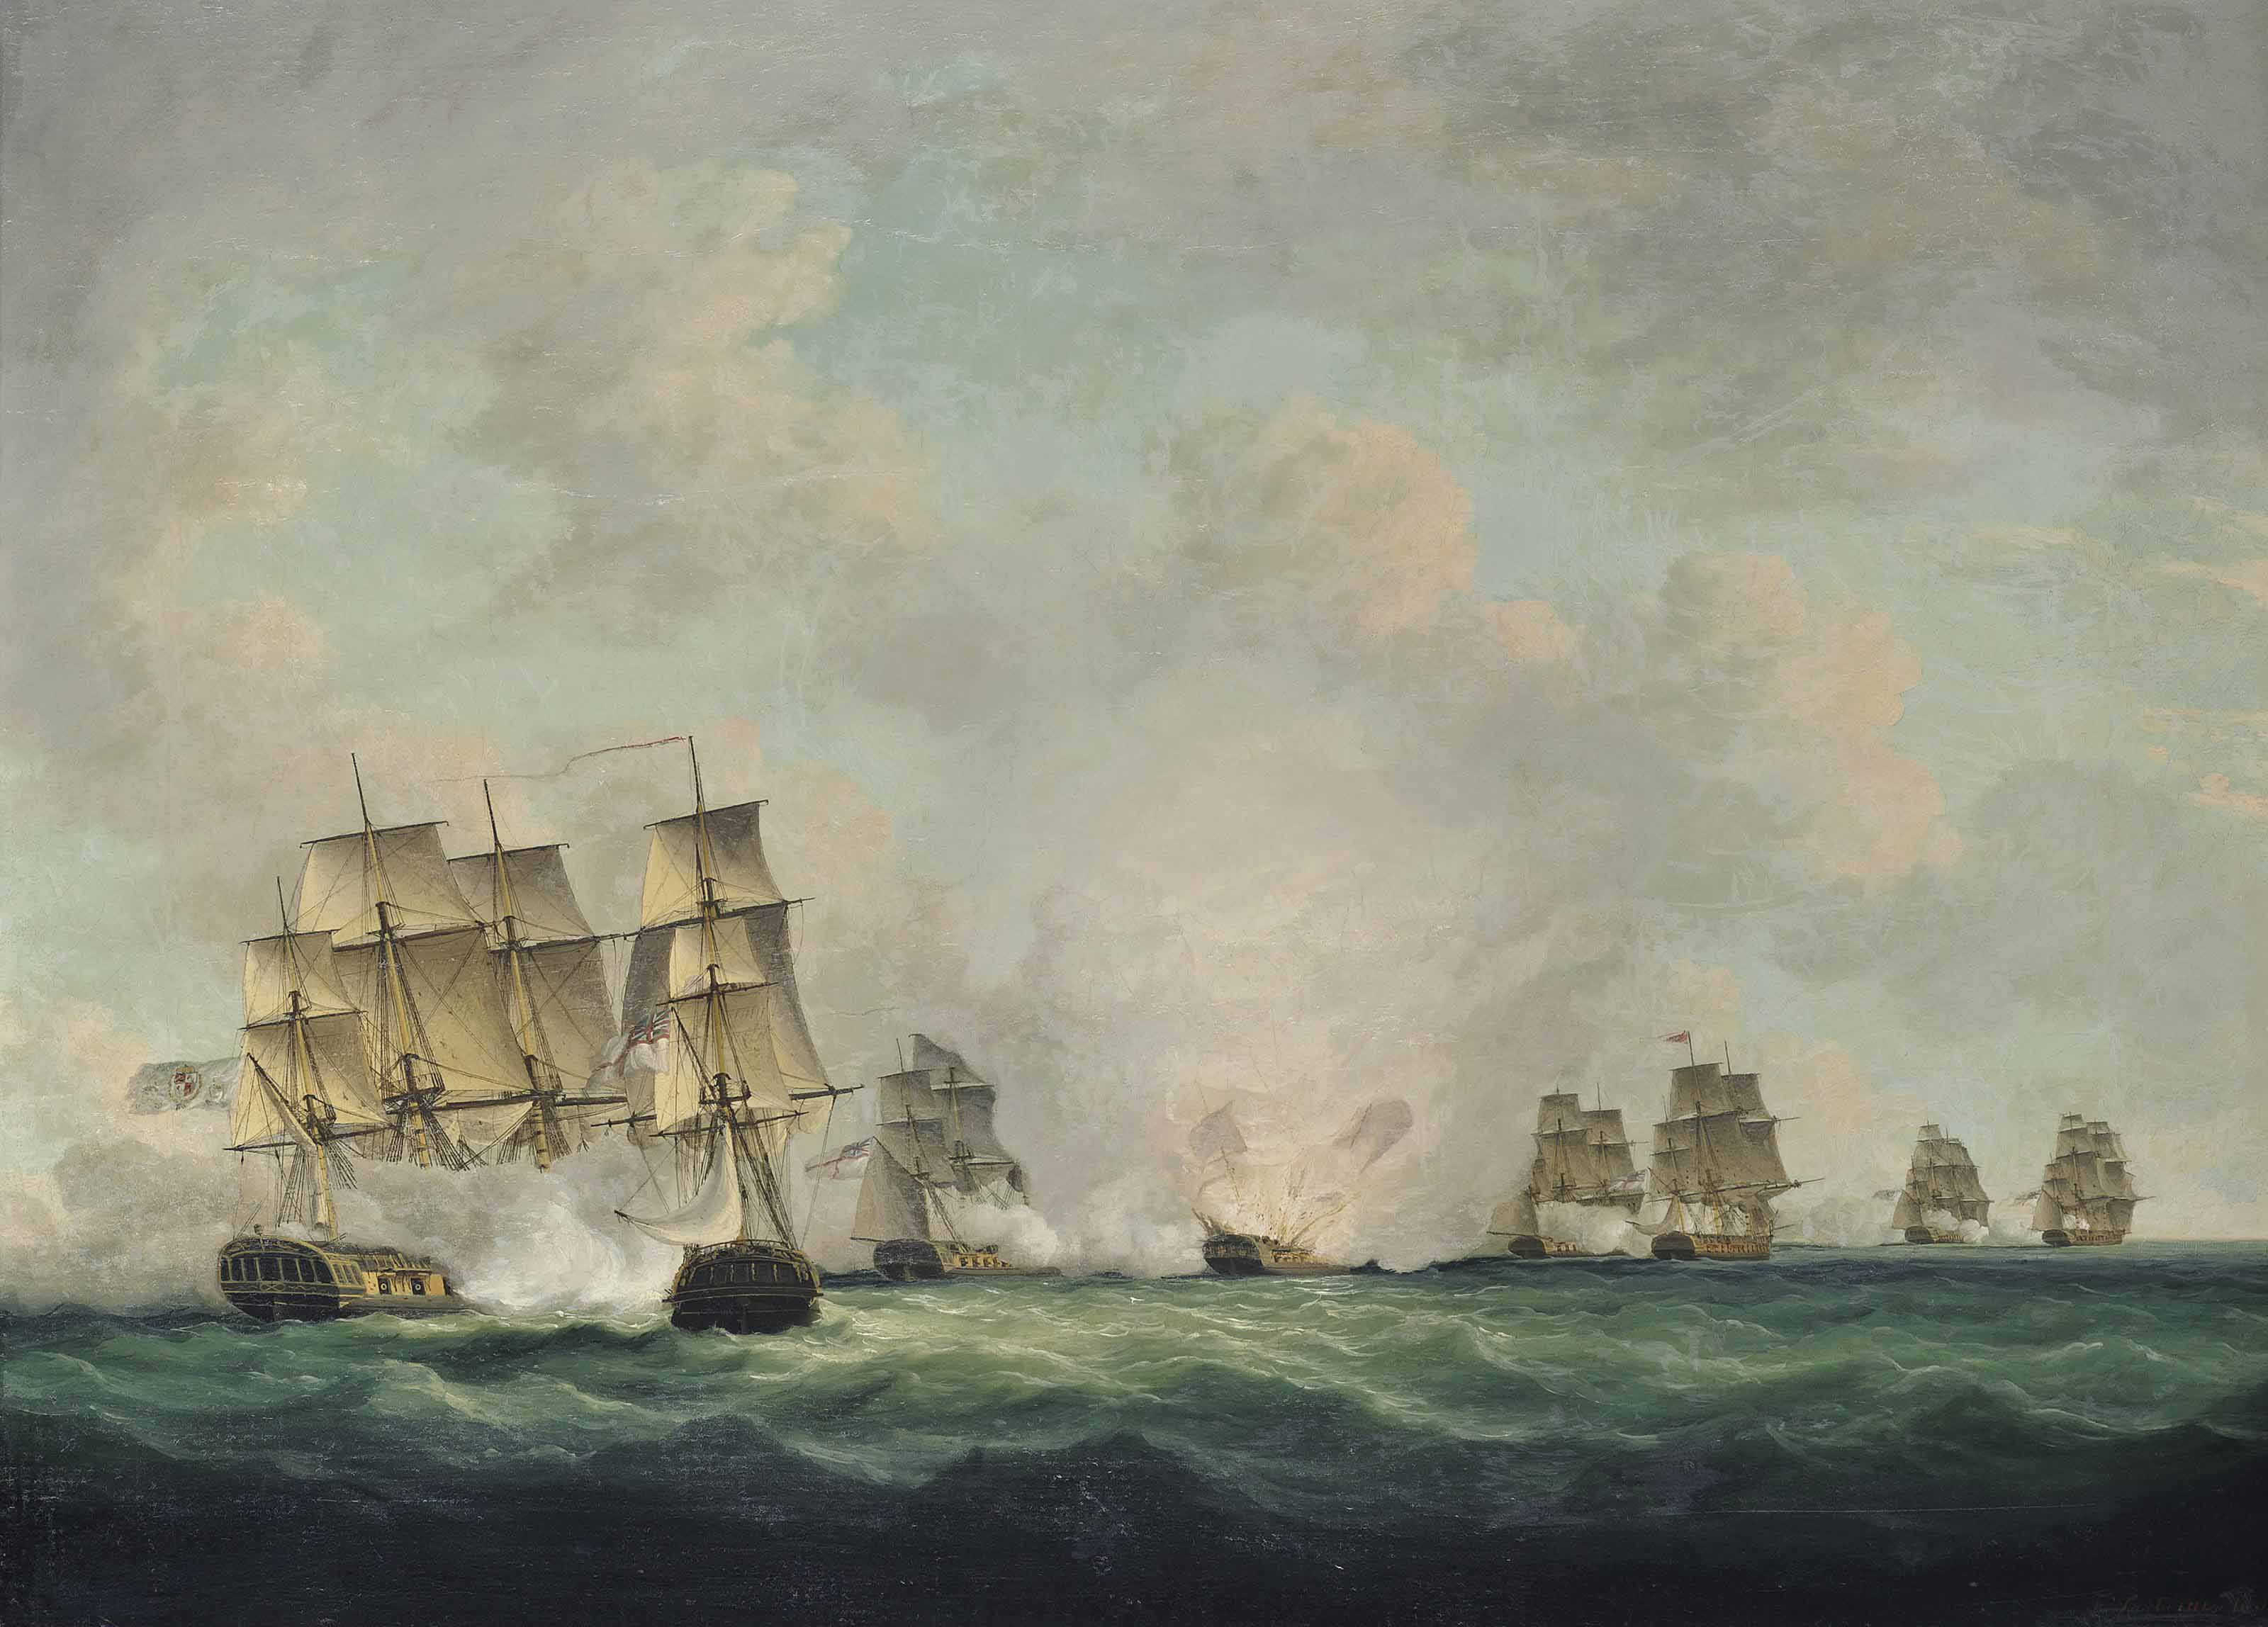 The battle of Cape Santa Maria, 5th October 1804: The capture of the Spanish treasure ships off Cadiz